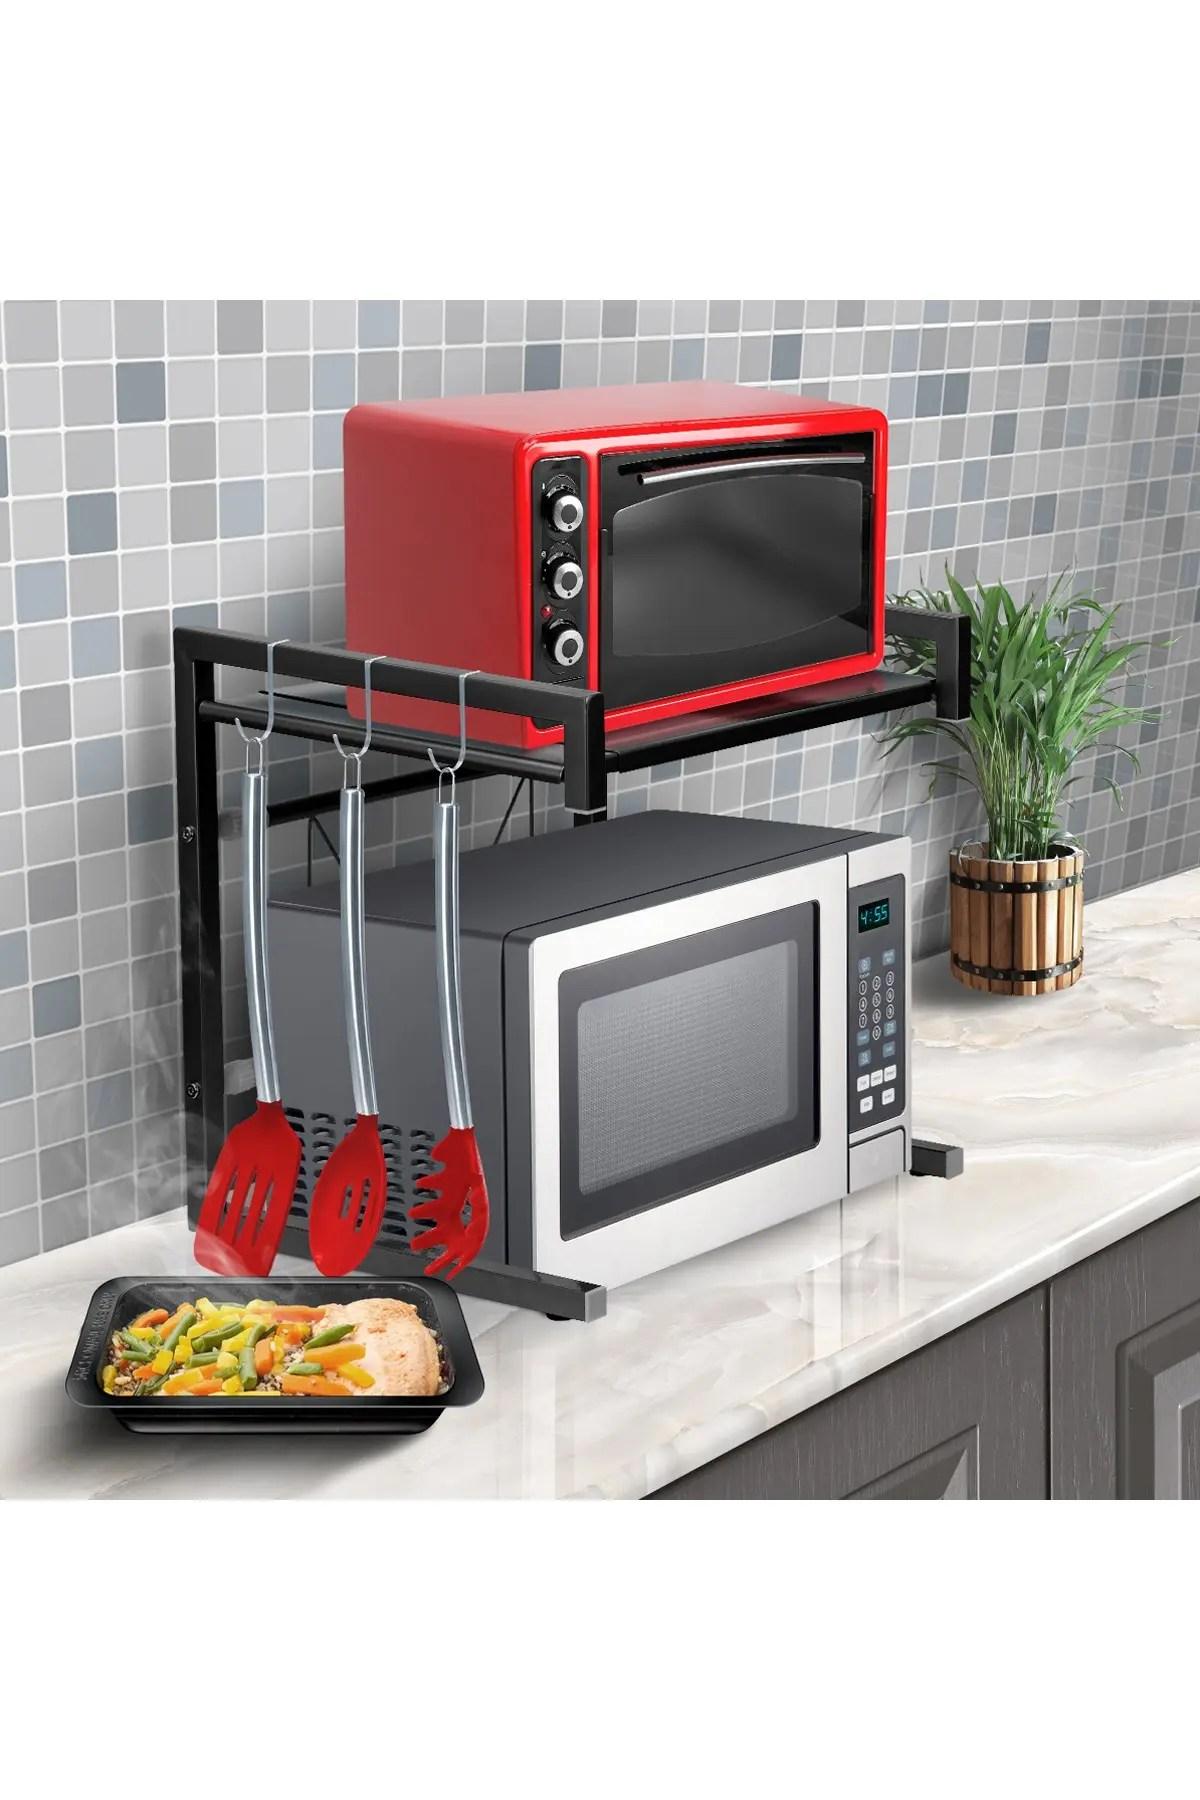 sorbus microwave oven rack shelf stand nordstrom rack